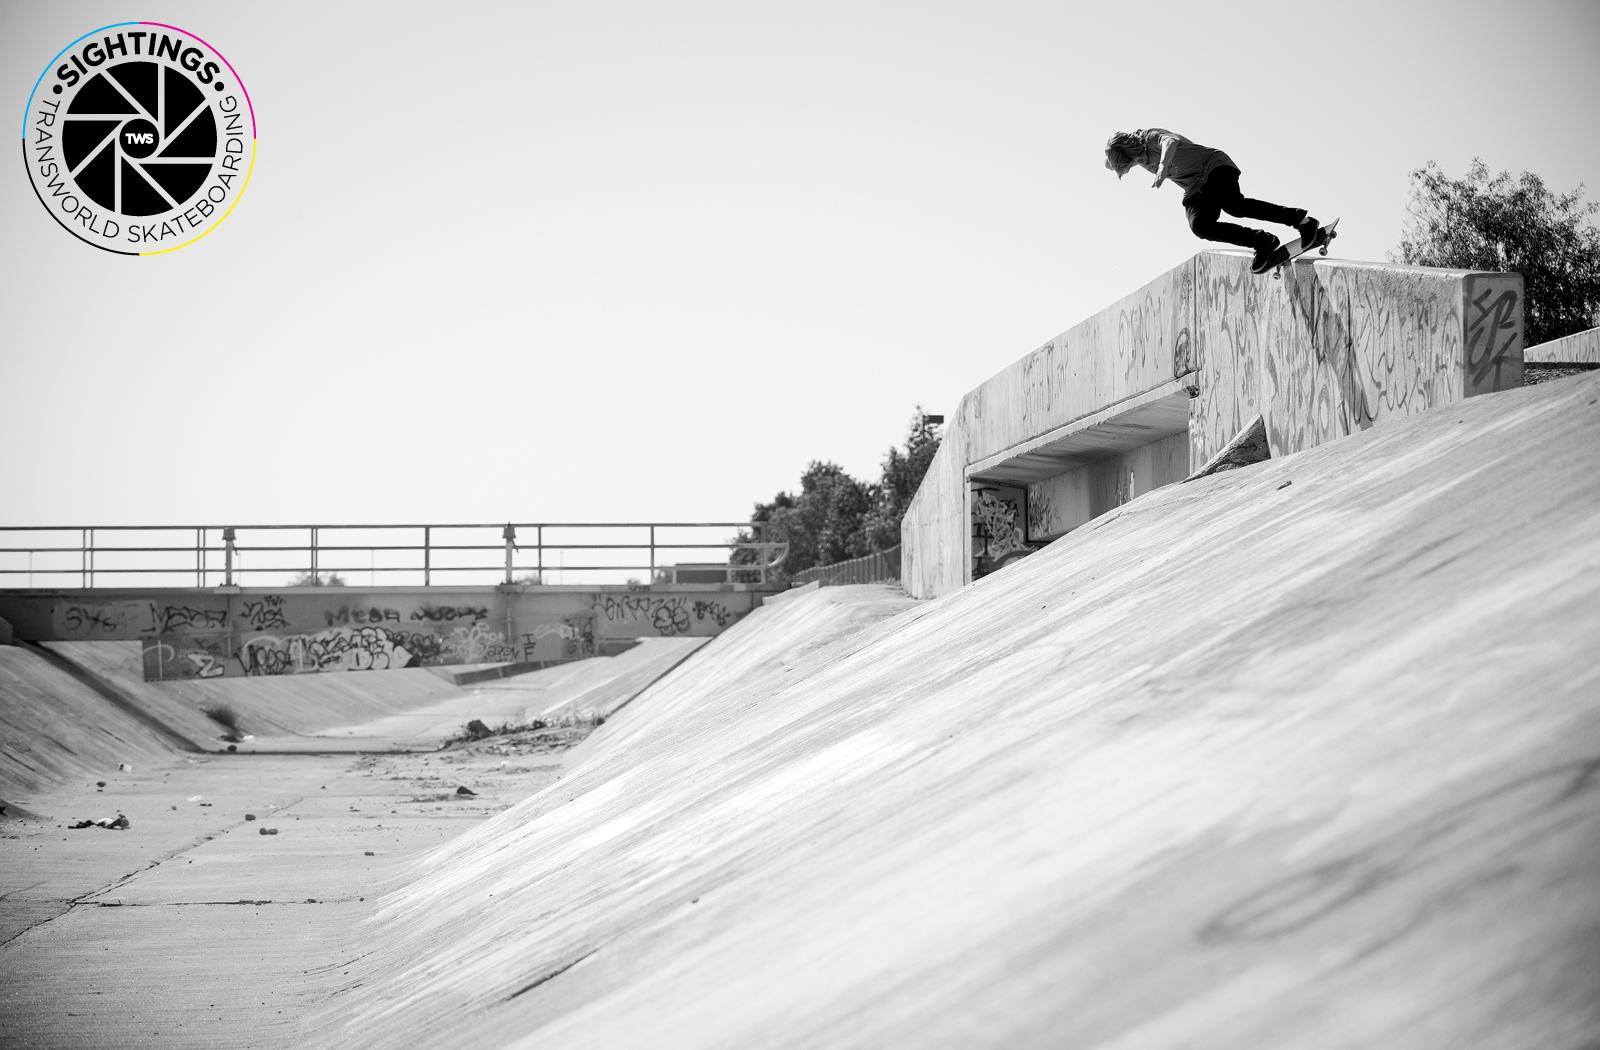 element skateboards wallpaper 1600x1050